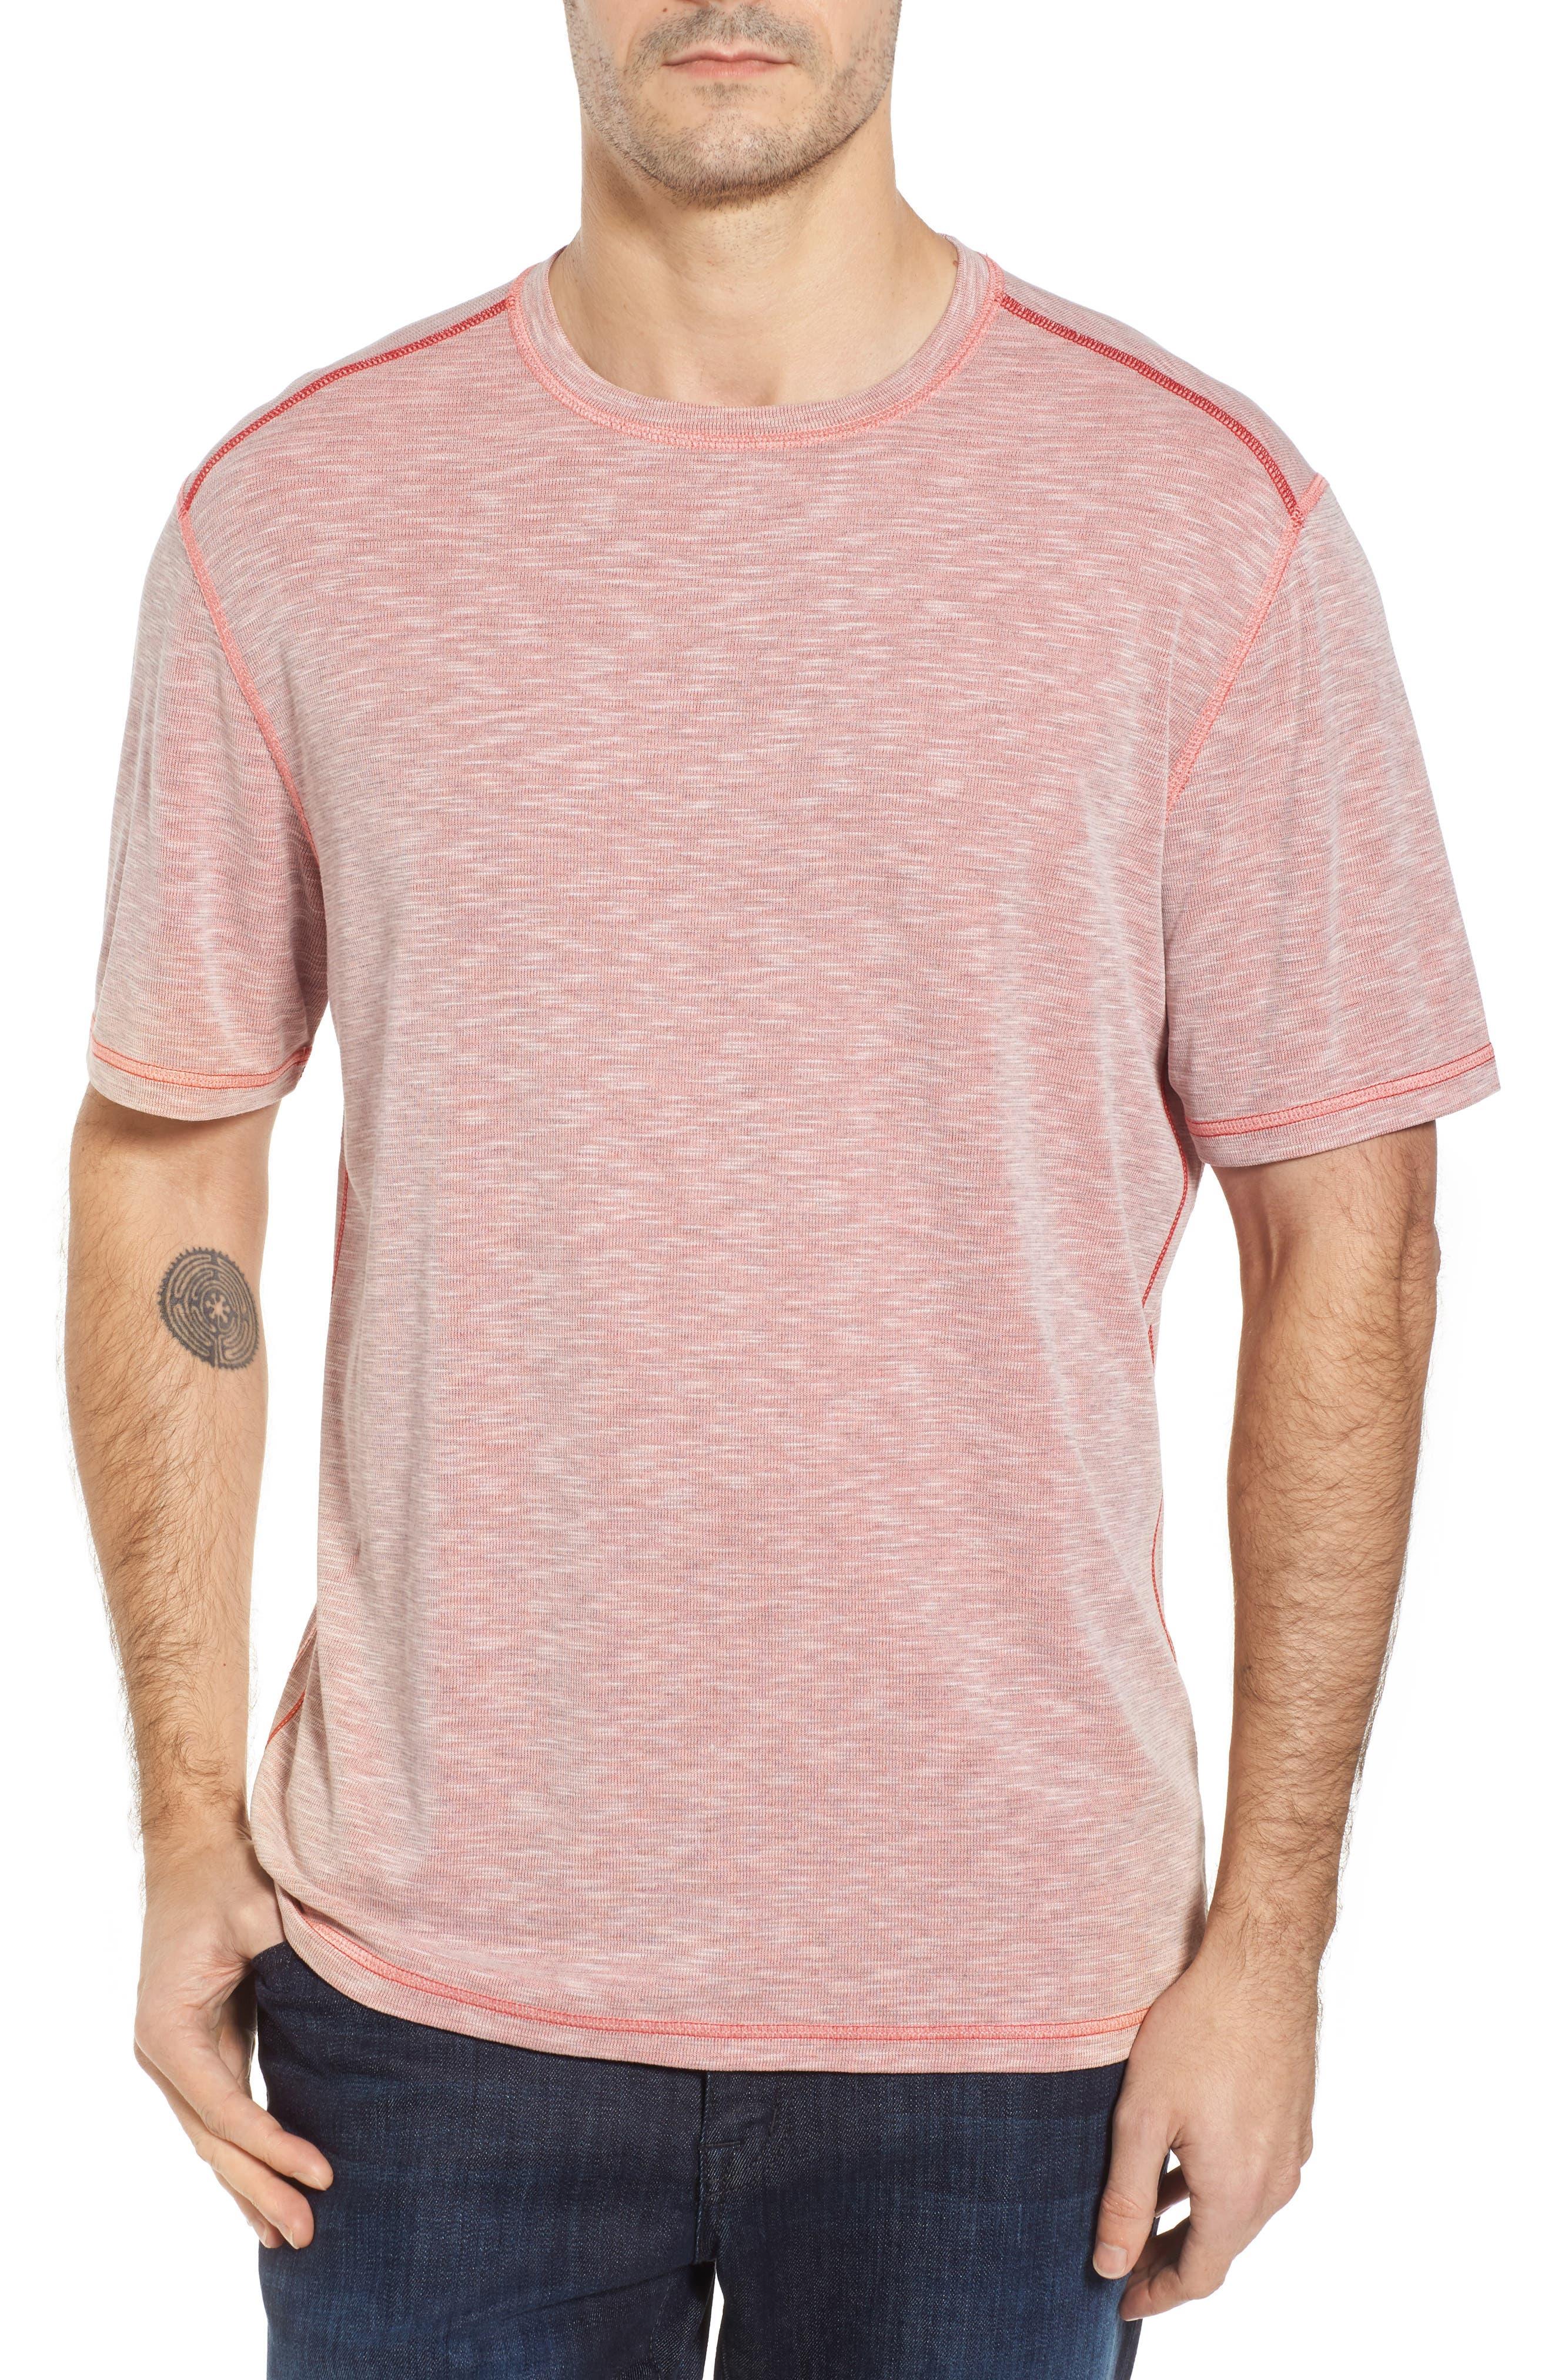 Flip Tide T-Shirt,                             Main thumbnail 1, color,                             Red Cherry